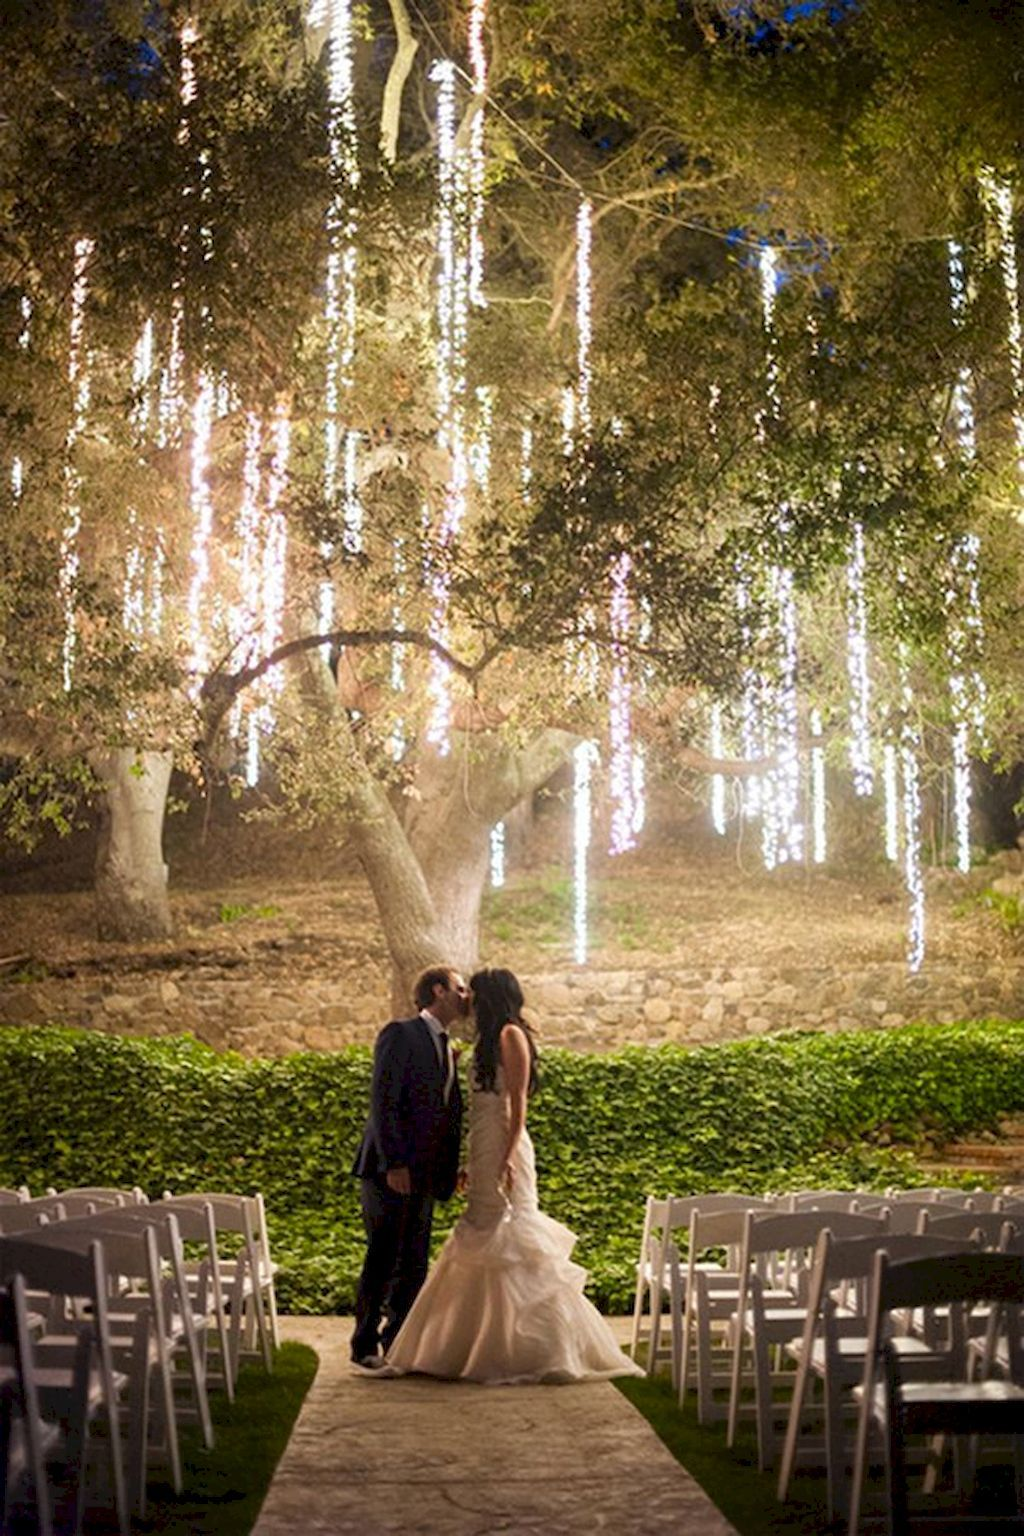 Wedding light decoration ideas   Elegant Outdoor Wedding Decor Ideas on A Budget  Possibility